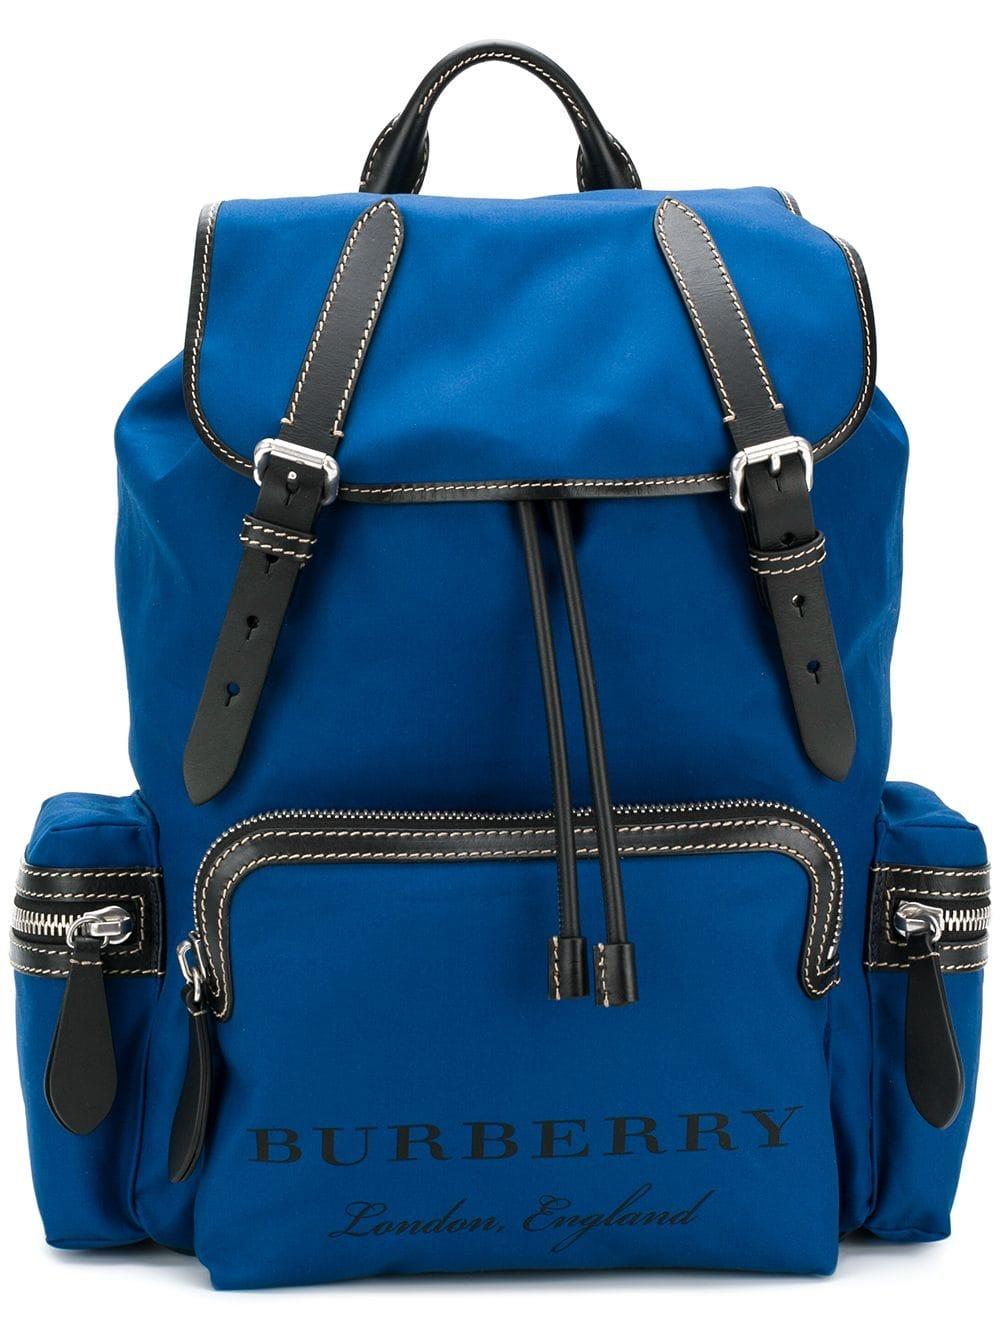 Burberry 'Rucksack' Rucksack - Blau